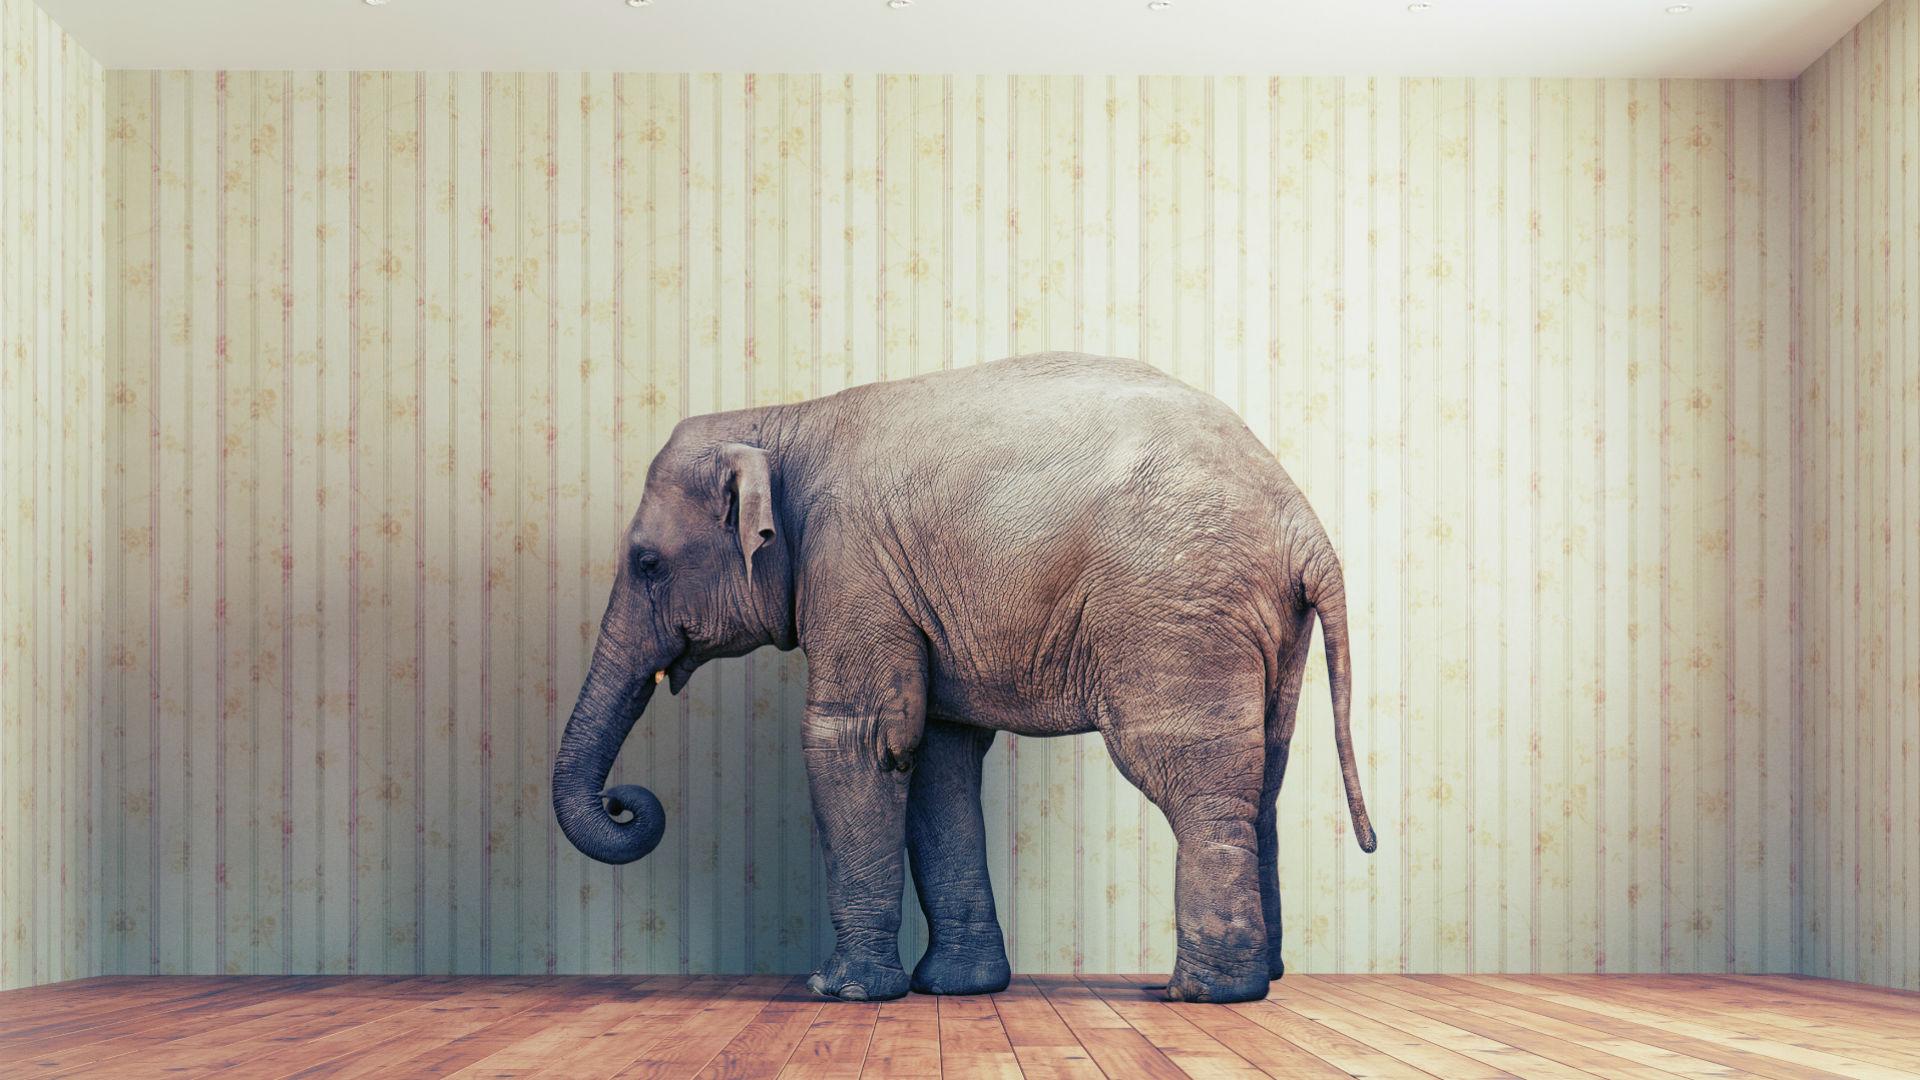 3 Powerful Ways to Kick-Start Your ABM Program and Get More Big Elephants